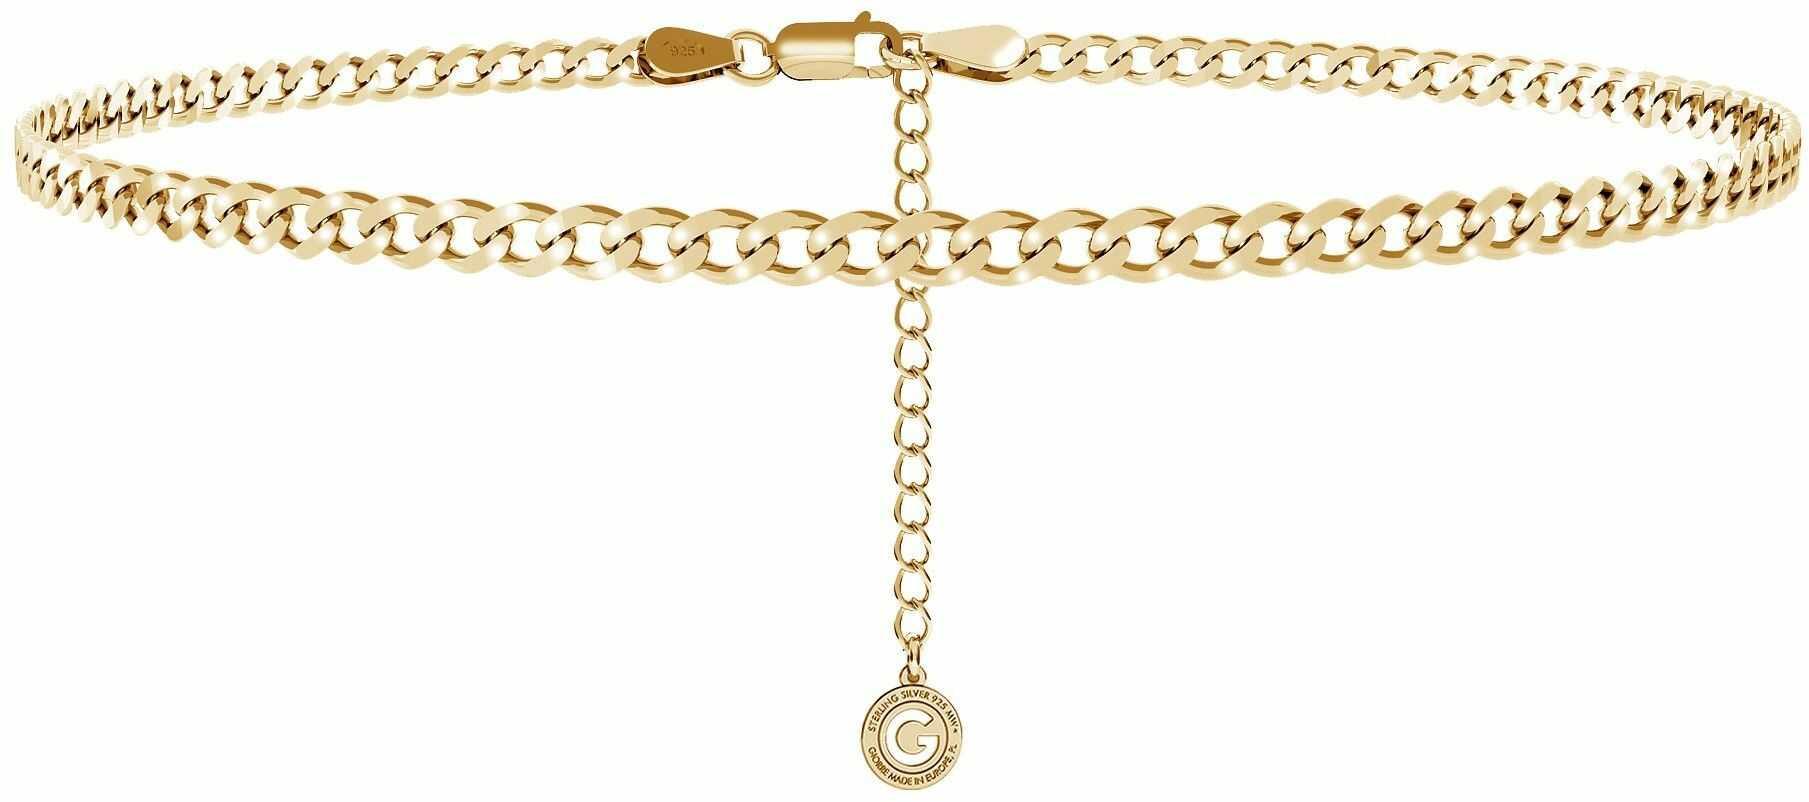 Srebrny łańcuszek choker pancerka, srebro 925 : Długość (cm) - 35 + 5, Srebro - kolor pokrycia - Pokrycie żółtym 18K złotem